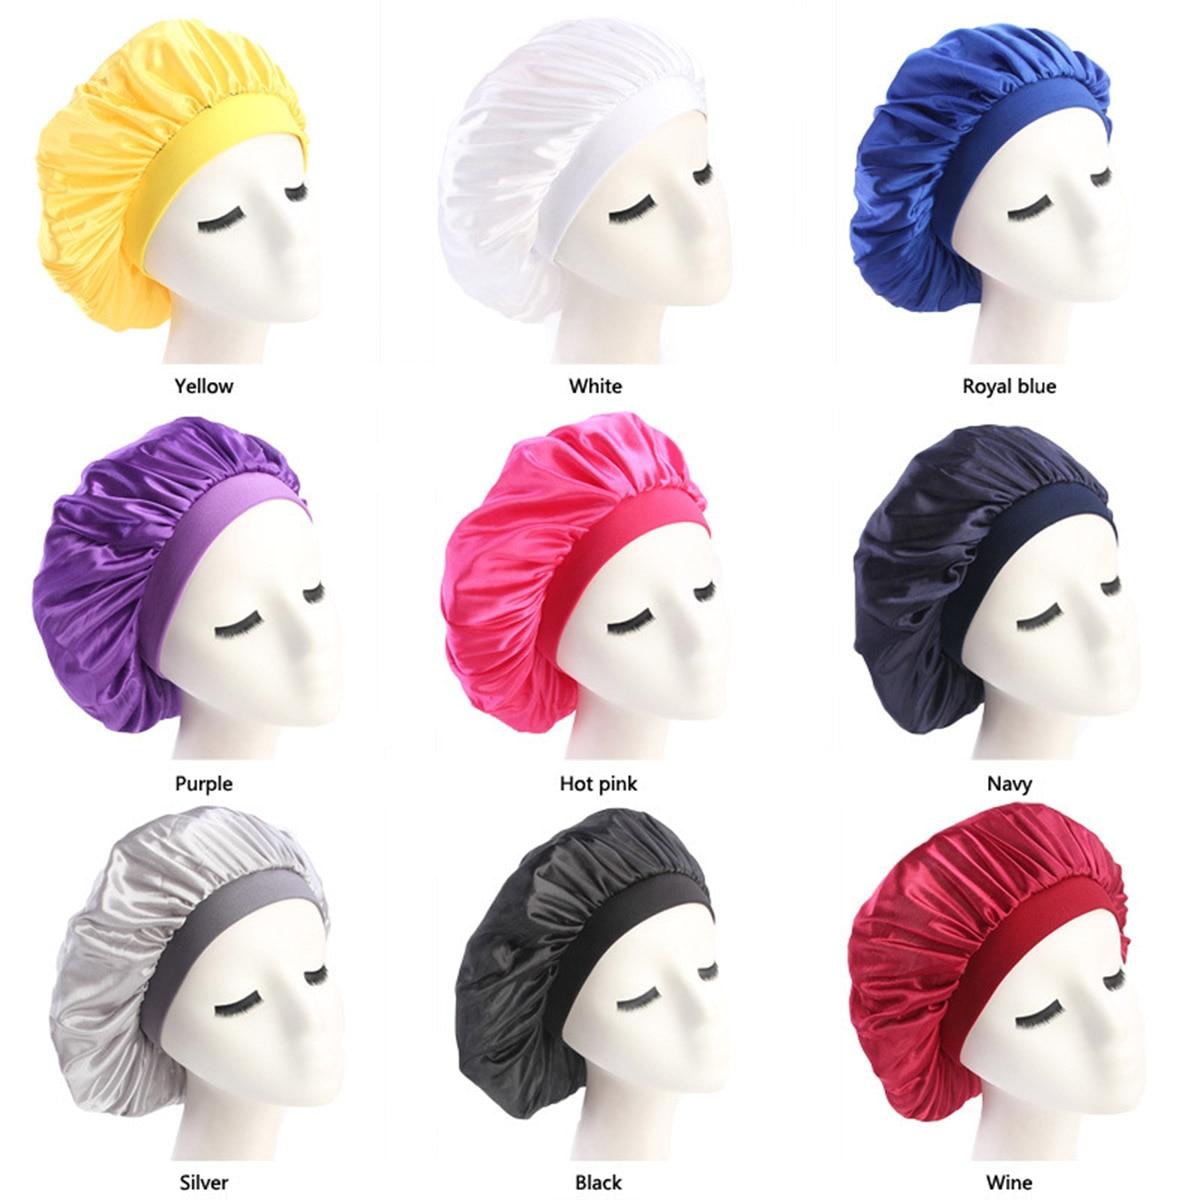 Hats/Caps Extra Large Satin Silk Bonnet Sleep Cap High Quality Solid Color Chemotherapy Caps Premium Elastic Band Hats